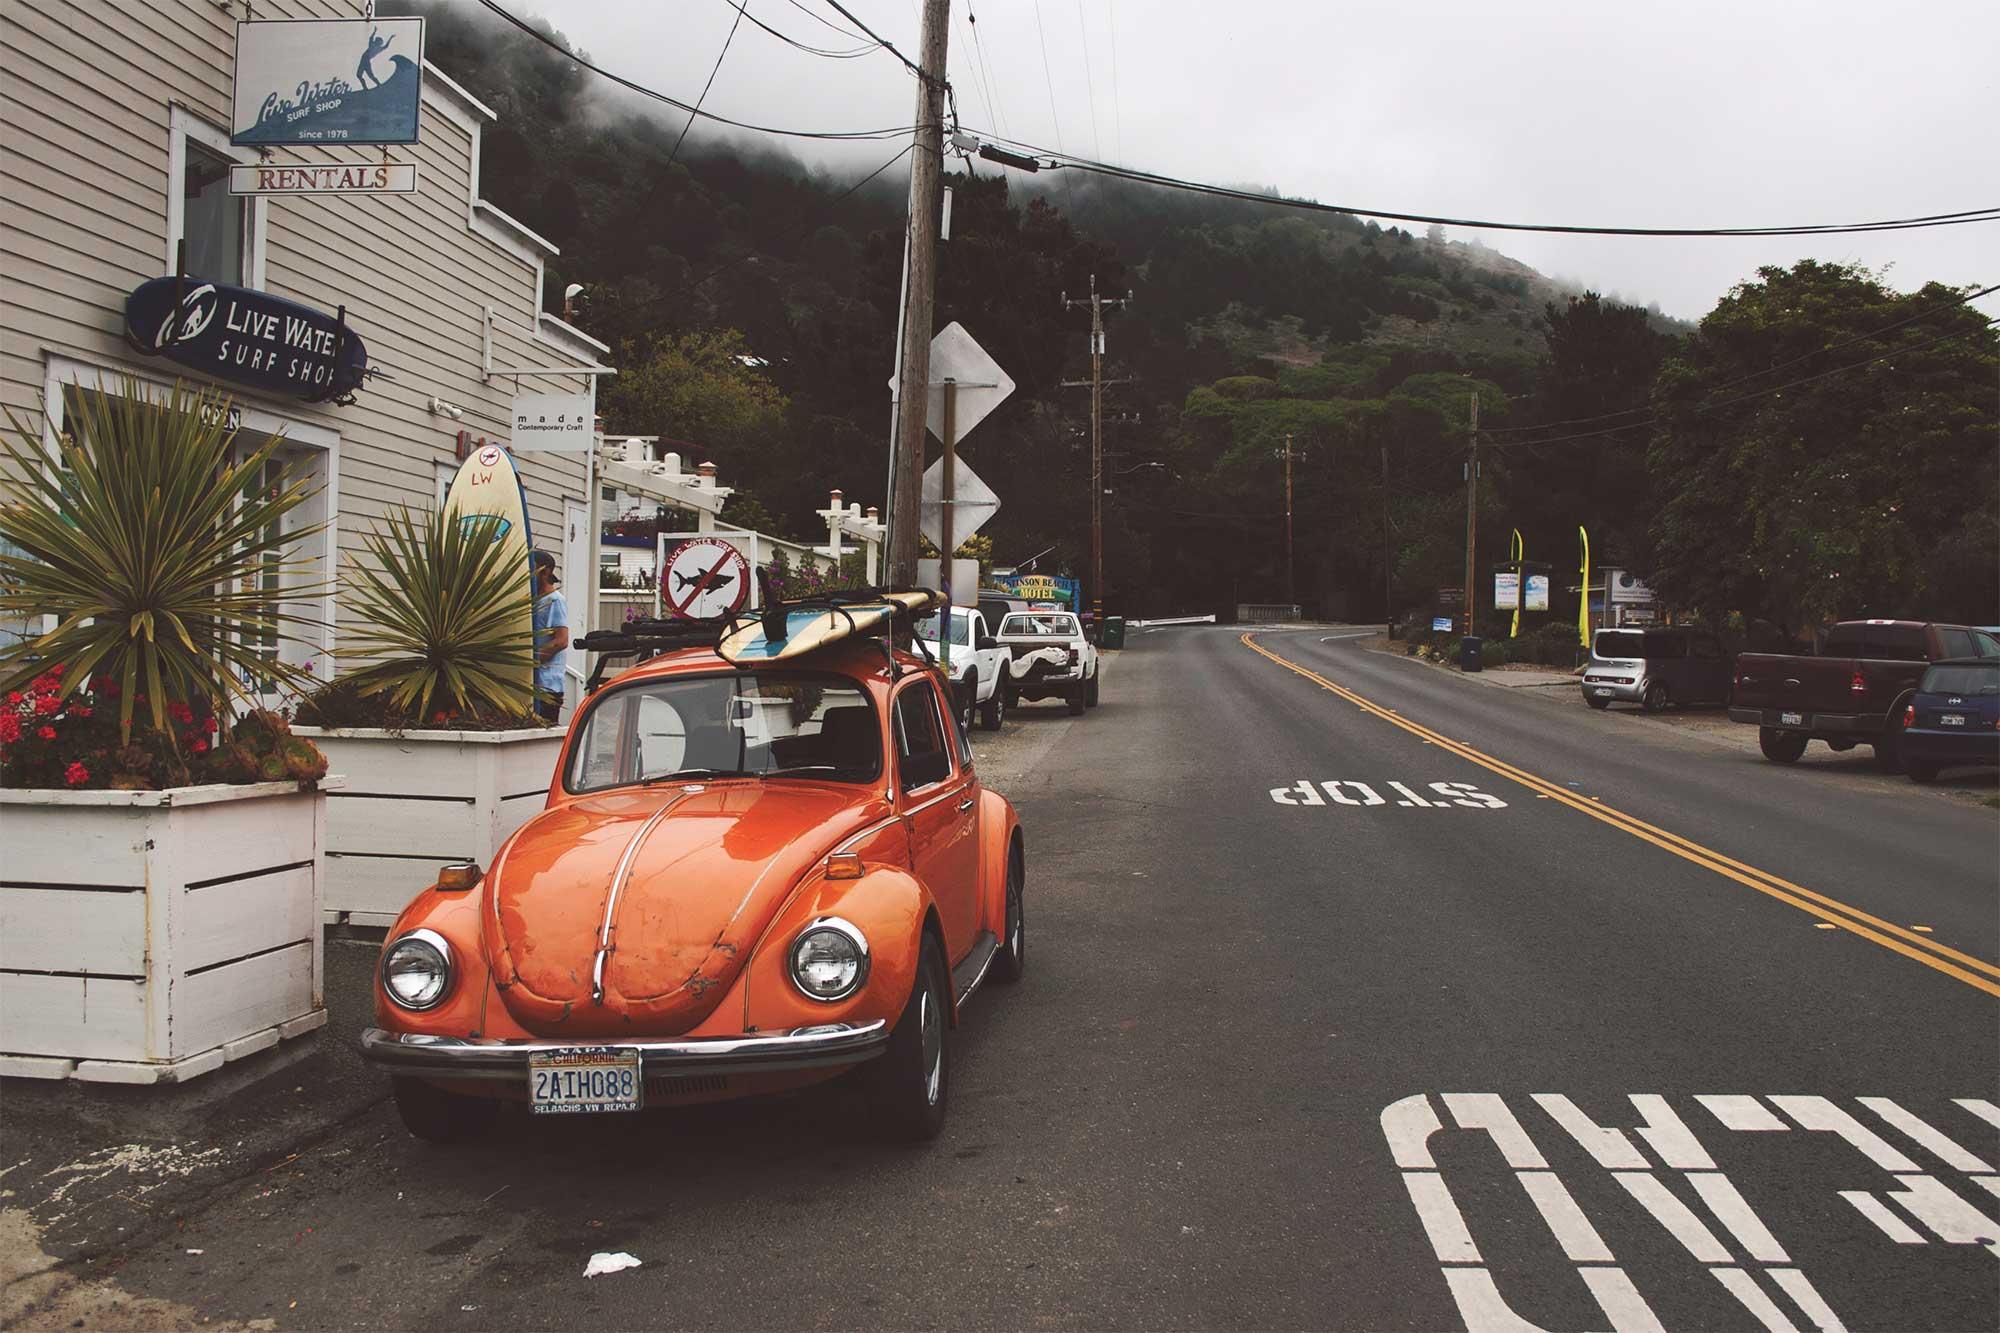 bug_surf